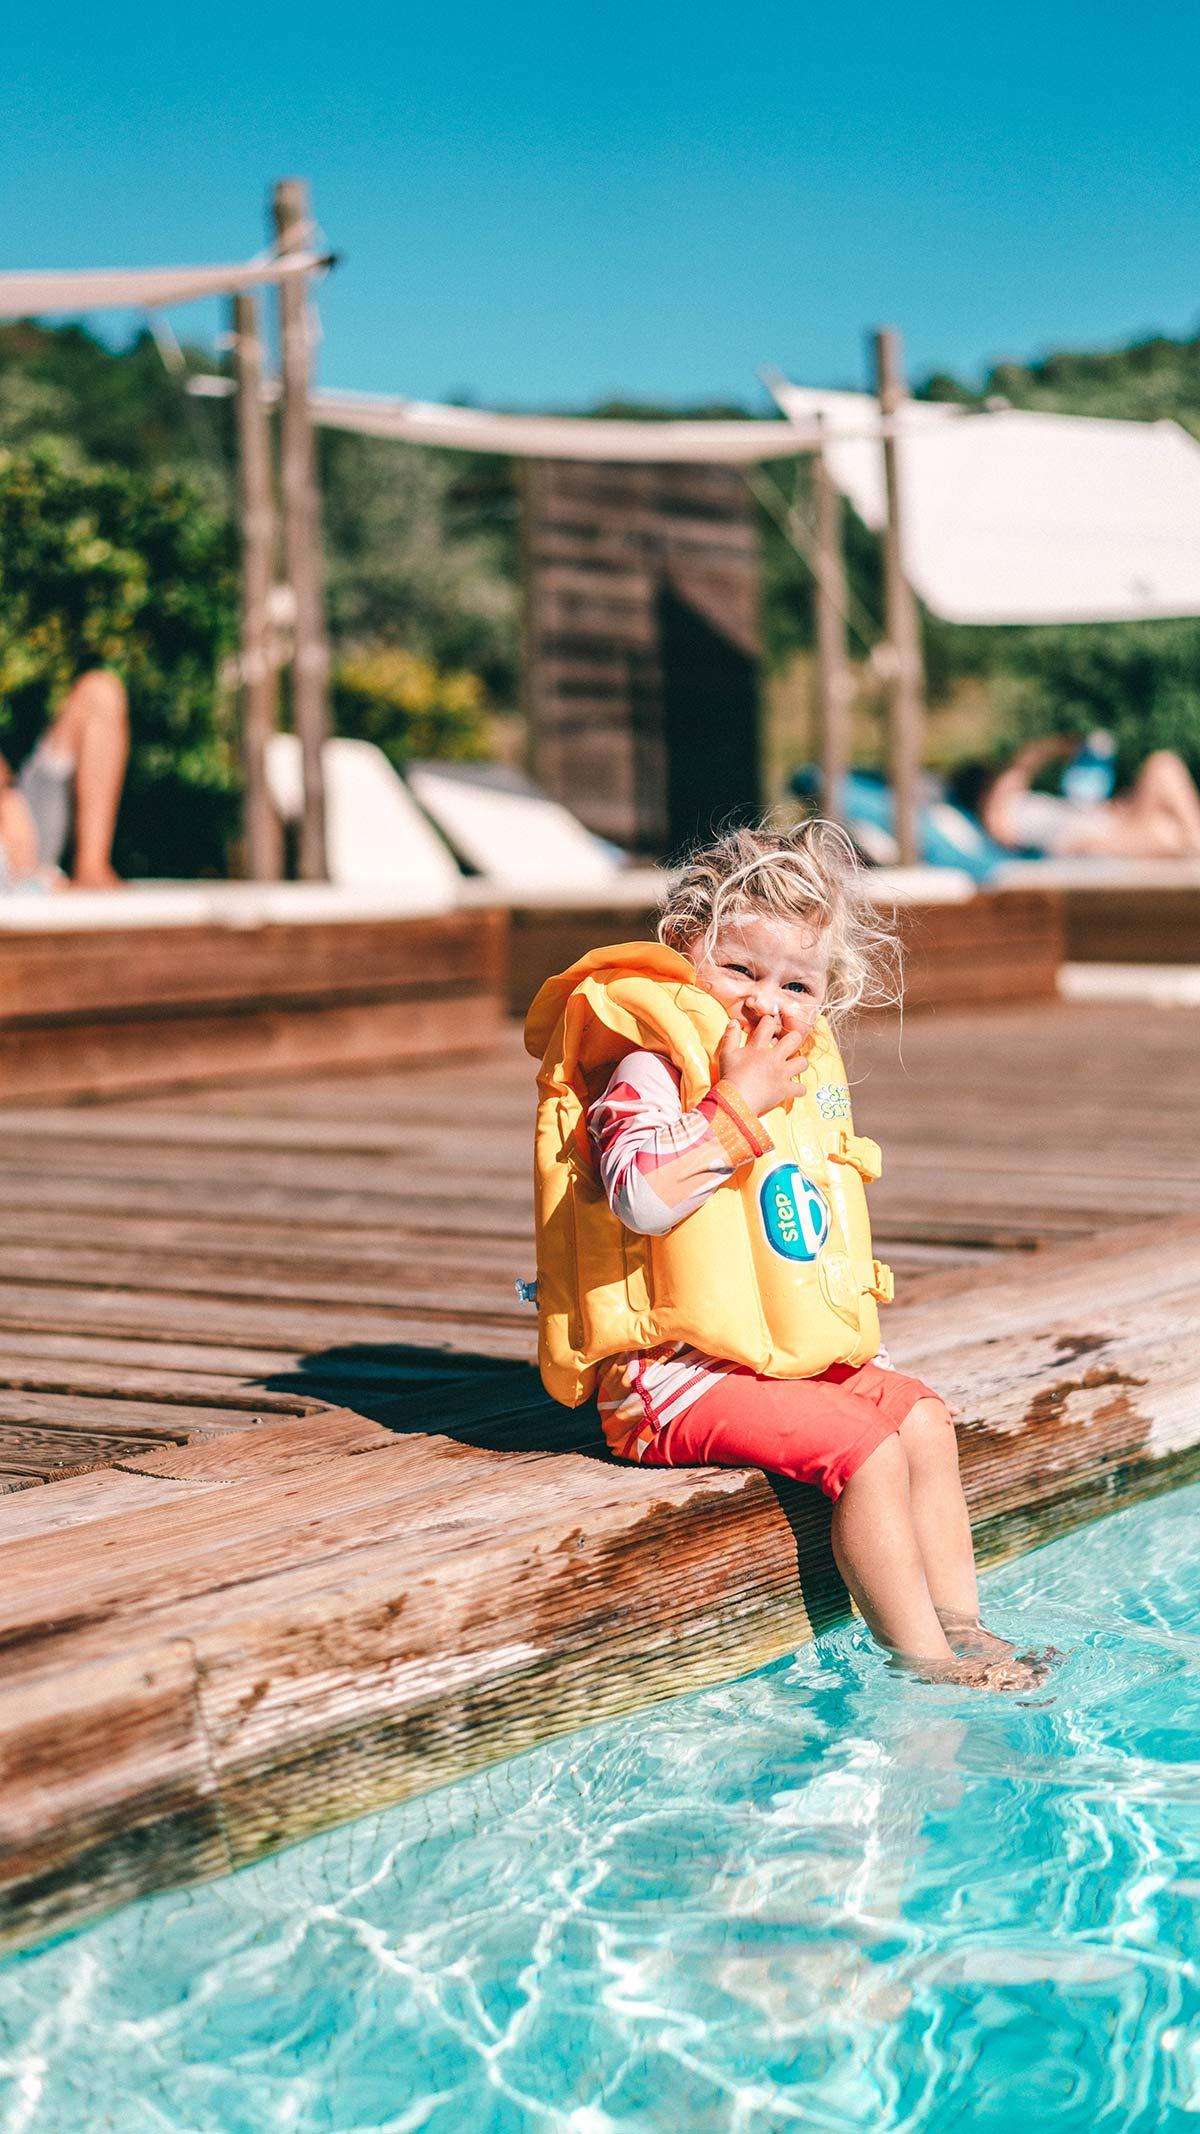 Alma am Pool in Portugal